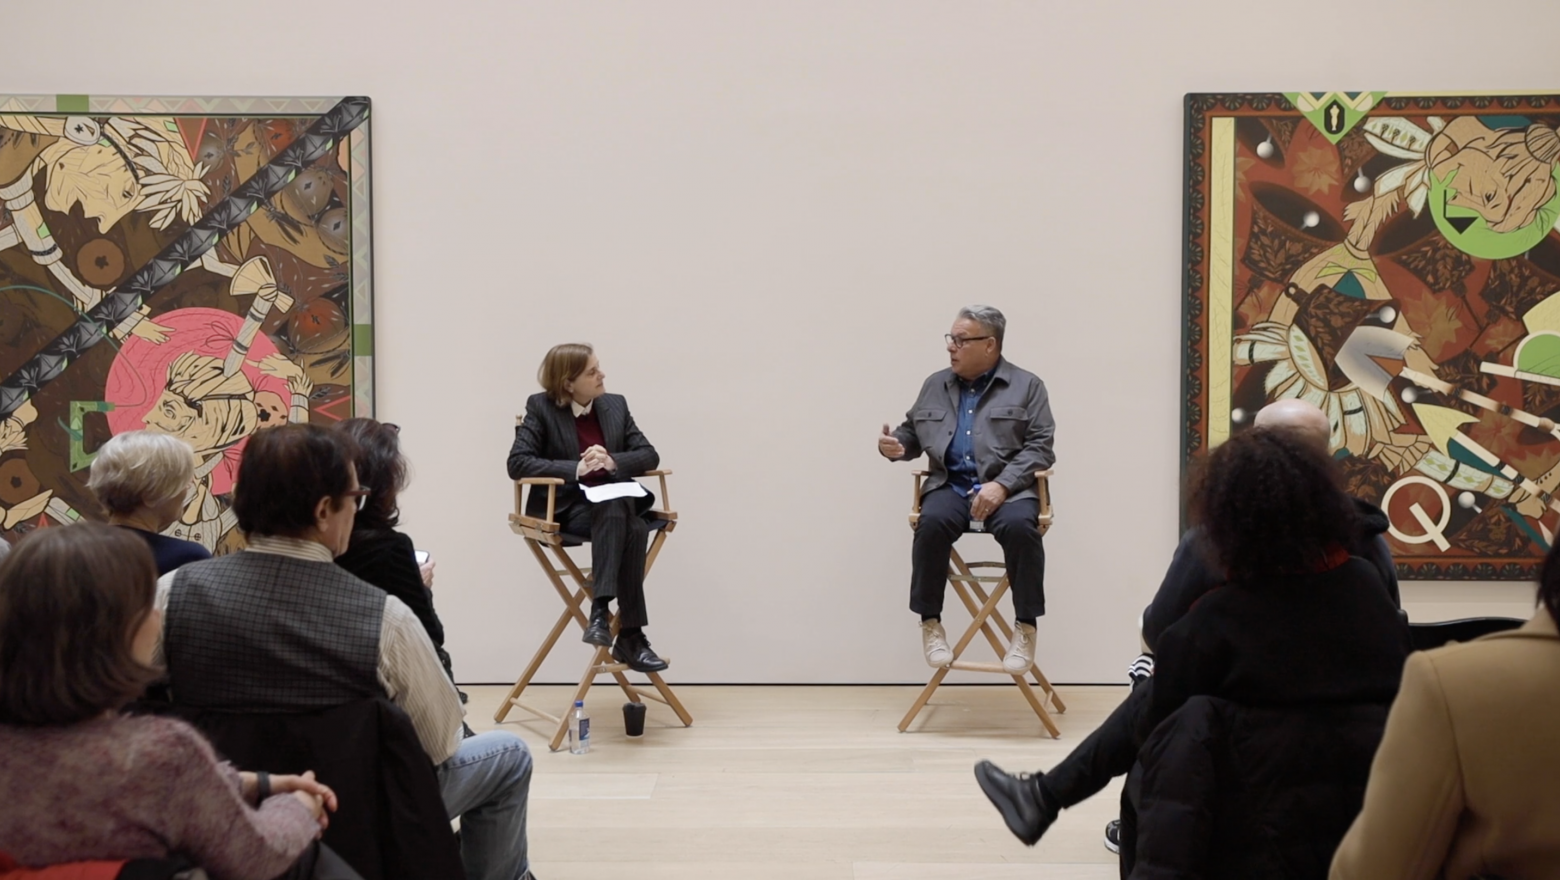 Lari Pittman in Conversation with Laura Hoptman